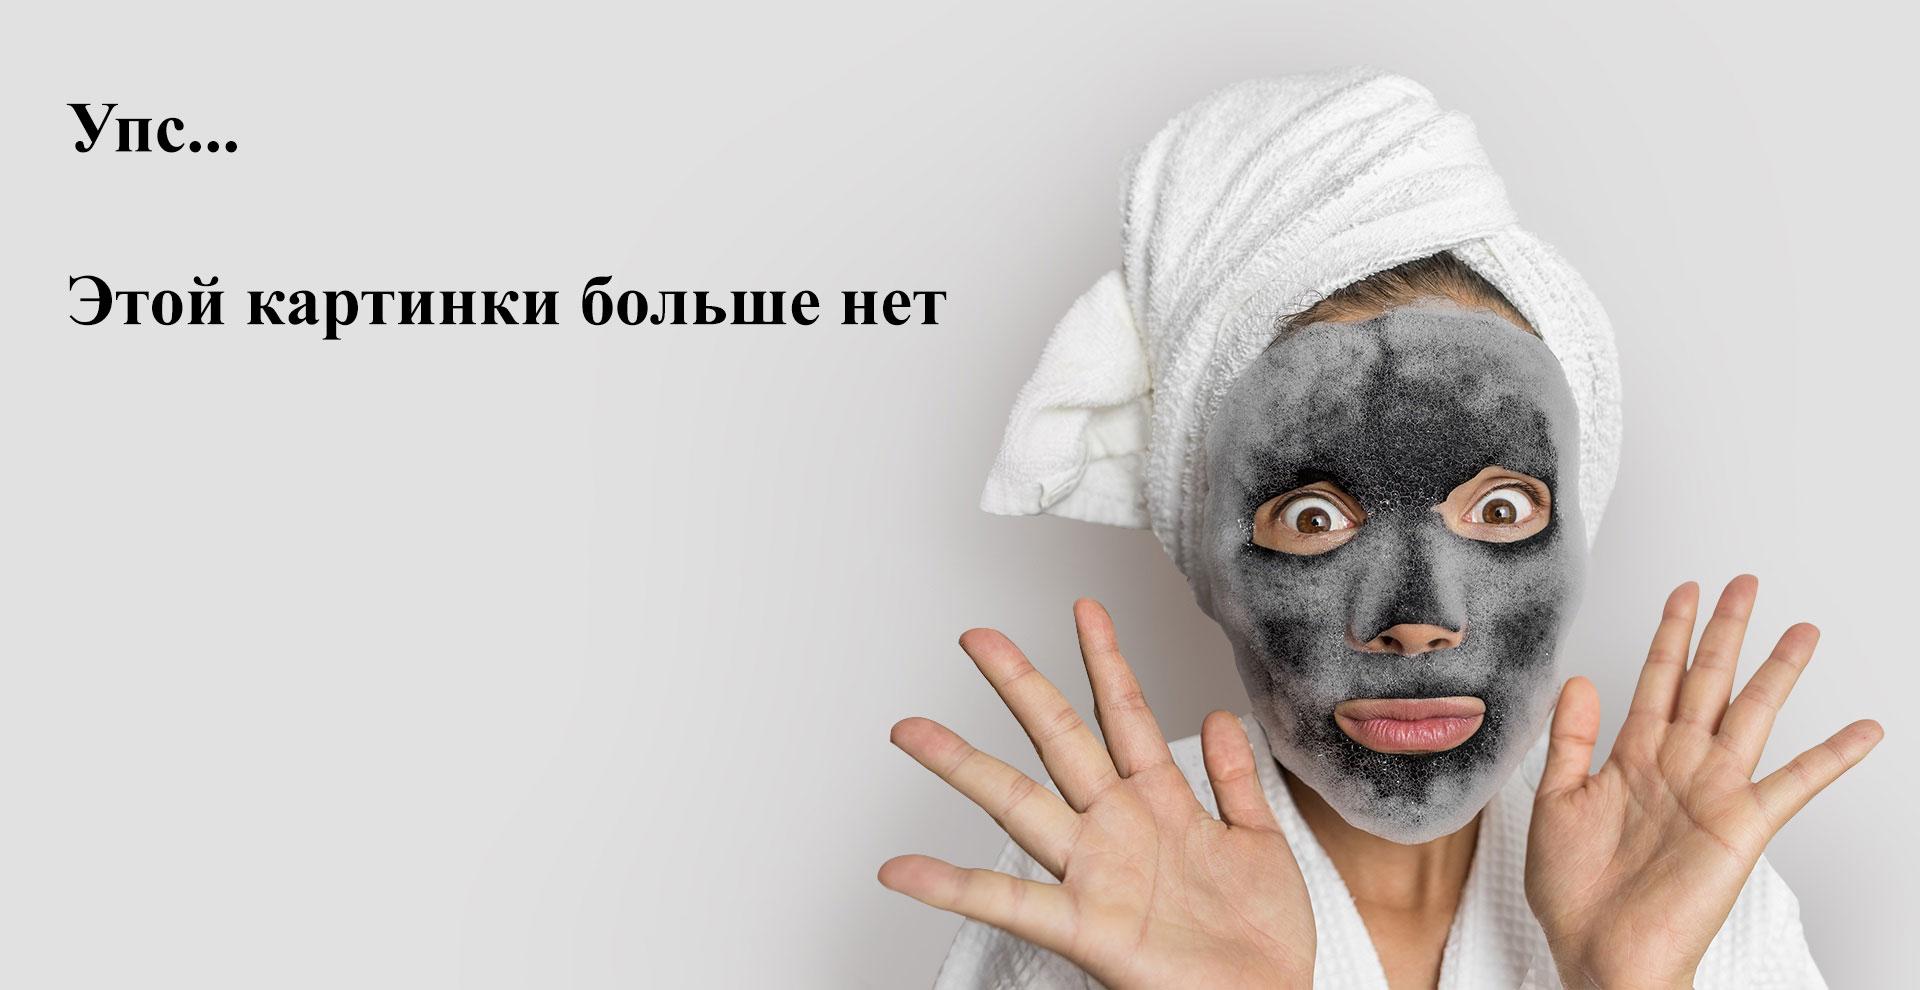 Луи Филипп, Гель-лак Limited, White